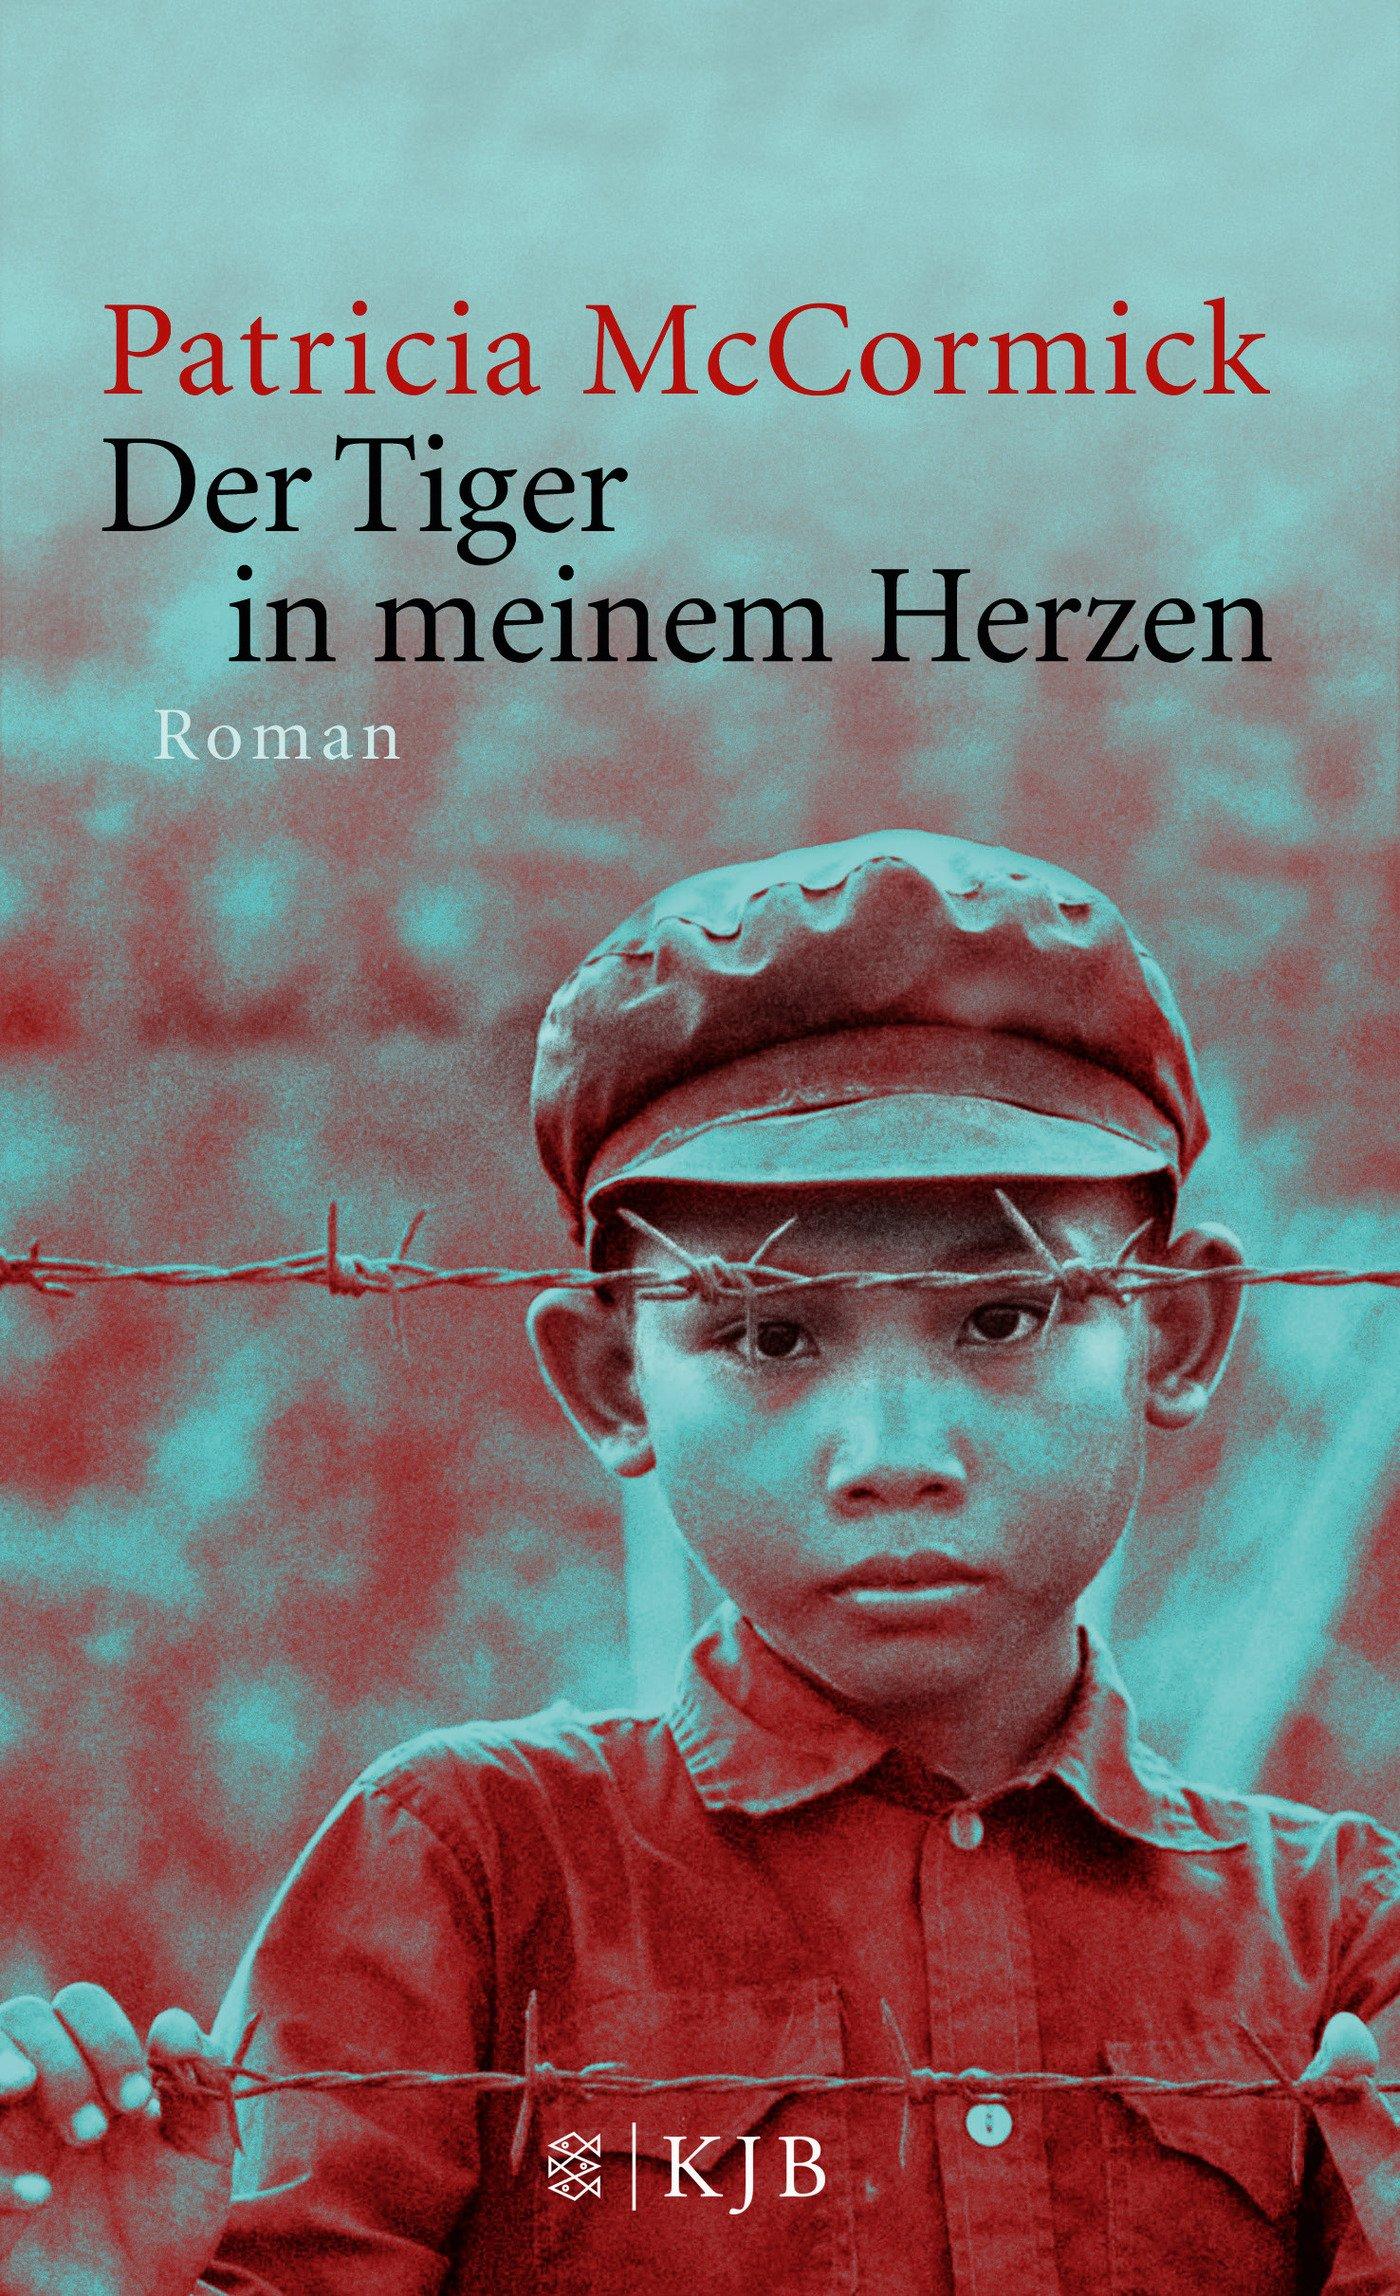 "Vaizdo rezultatas pagal užklausą ""Der Tiger in meinem Herzen von Patricia McCormick"""